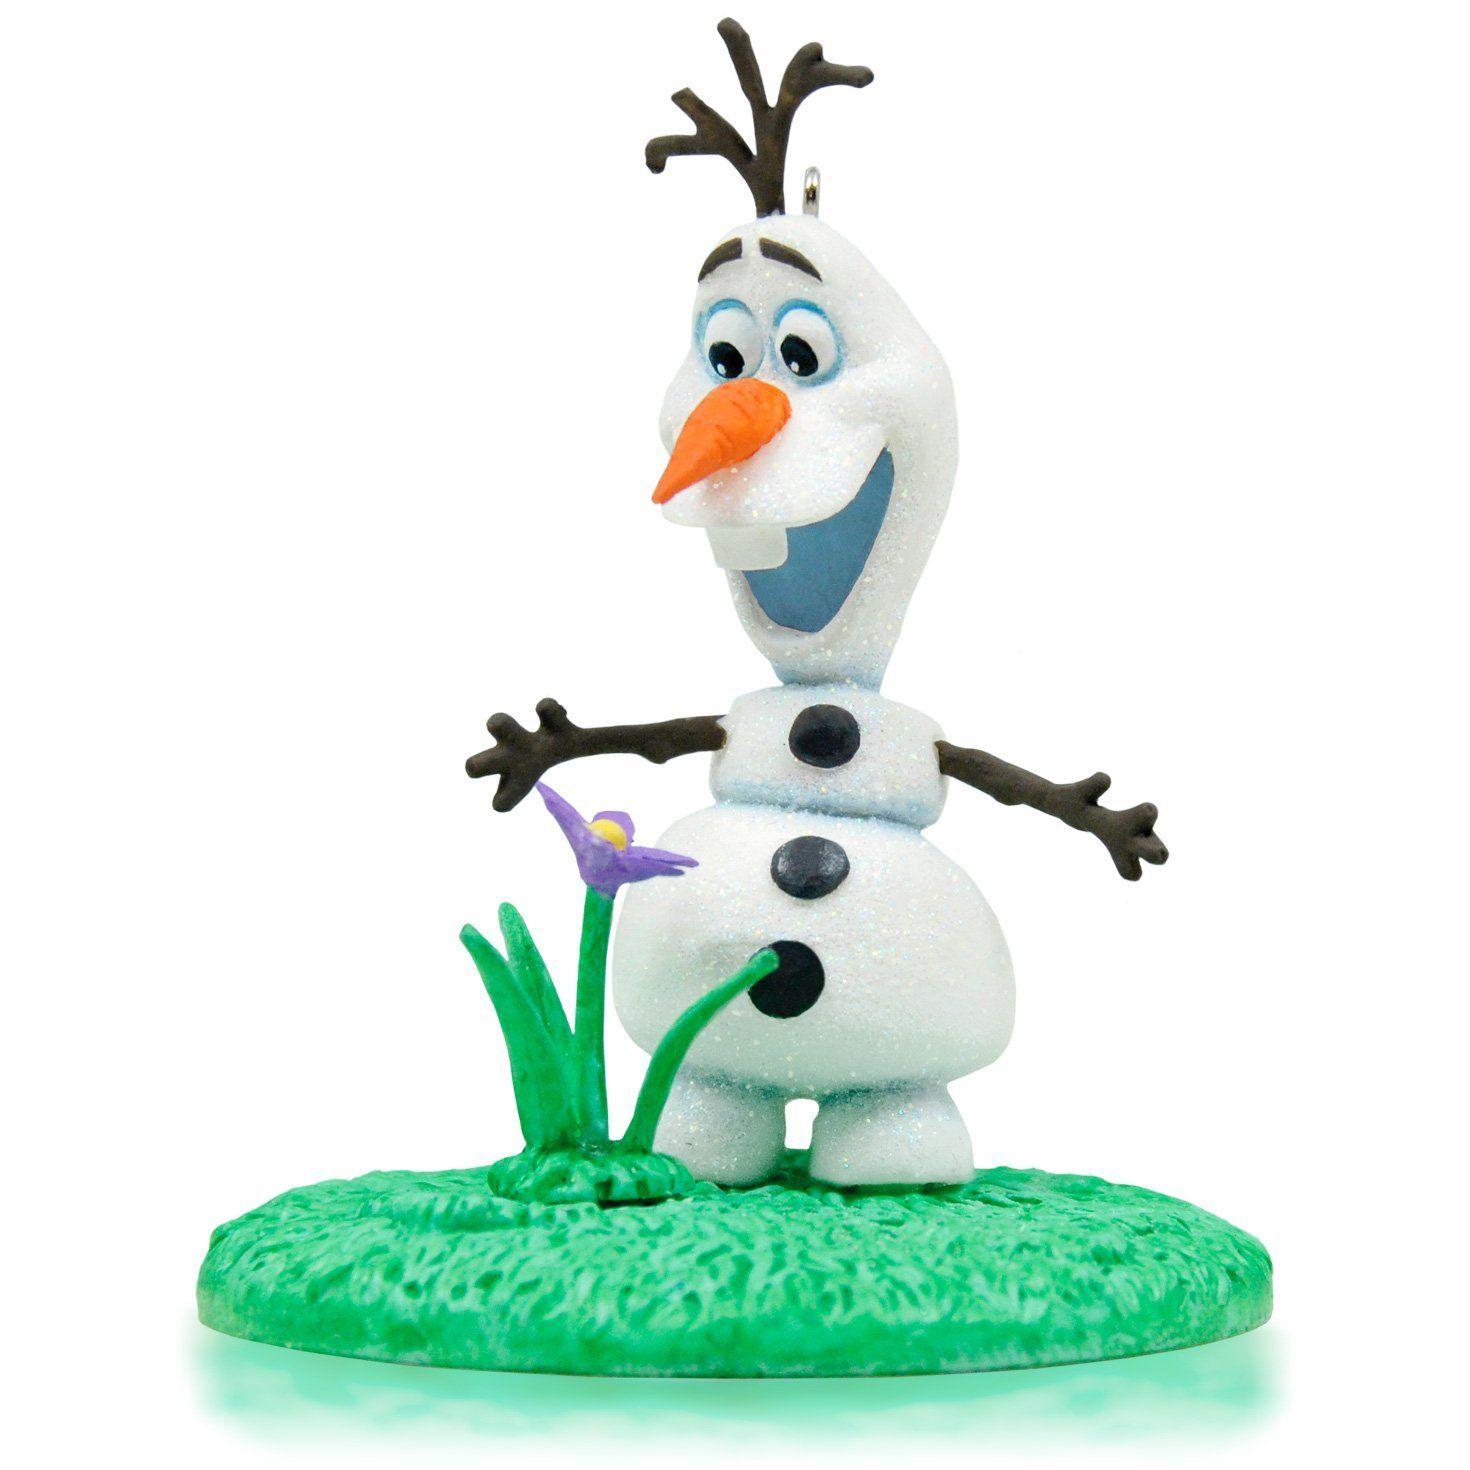 Hallmark Keepsake Disney Frozen Olaf In Summer Holiday Ornament